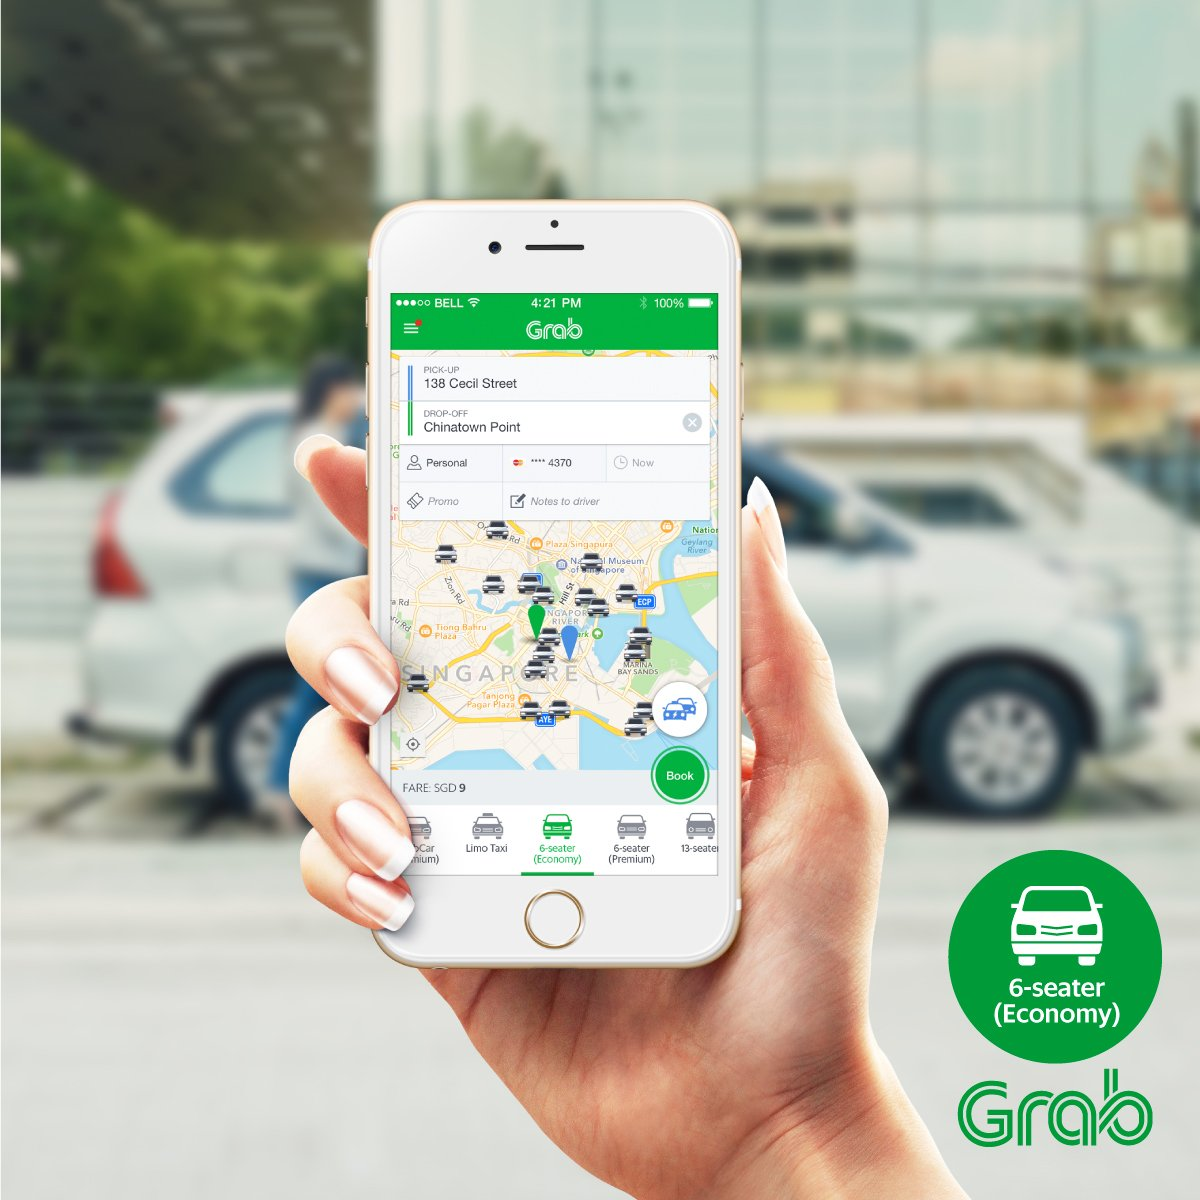 Grab Singapore On Twitter Enjoy Bigger Rides With Grabcar S 6